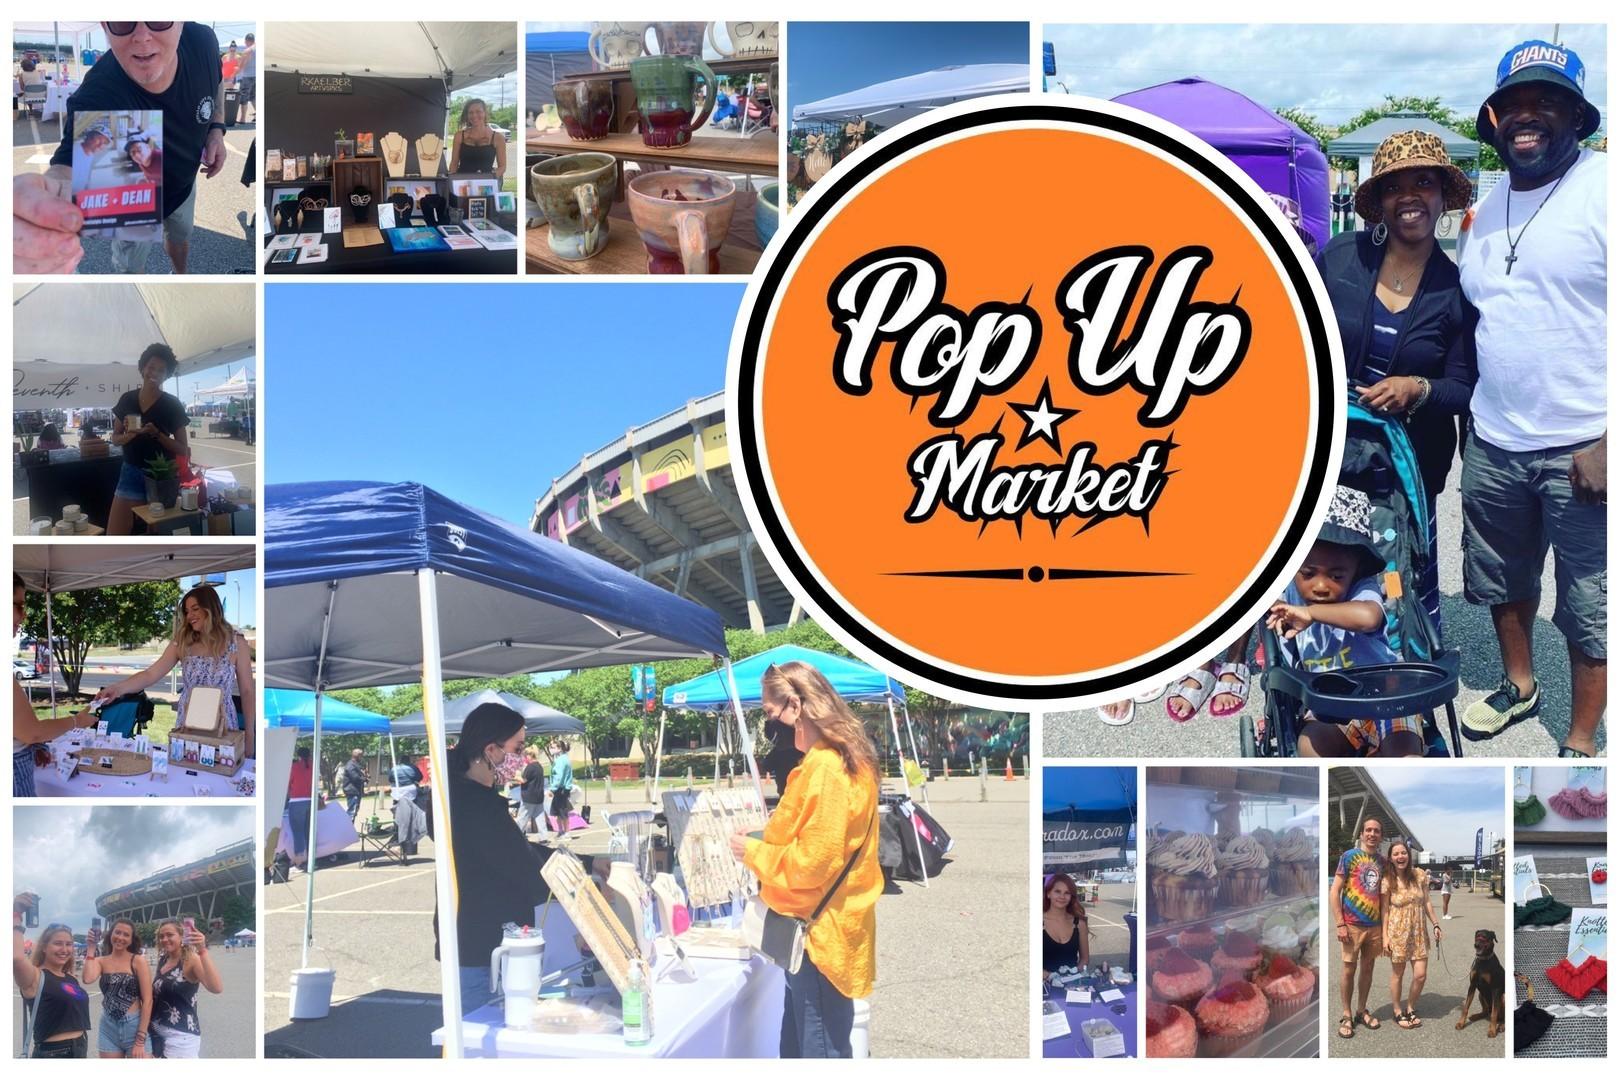 PopUp Market at The Diamond